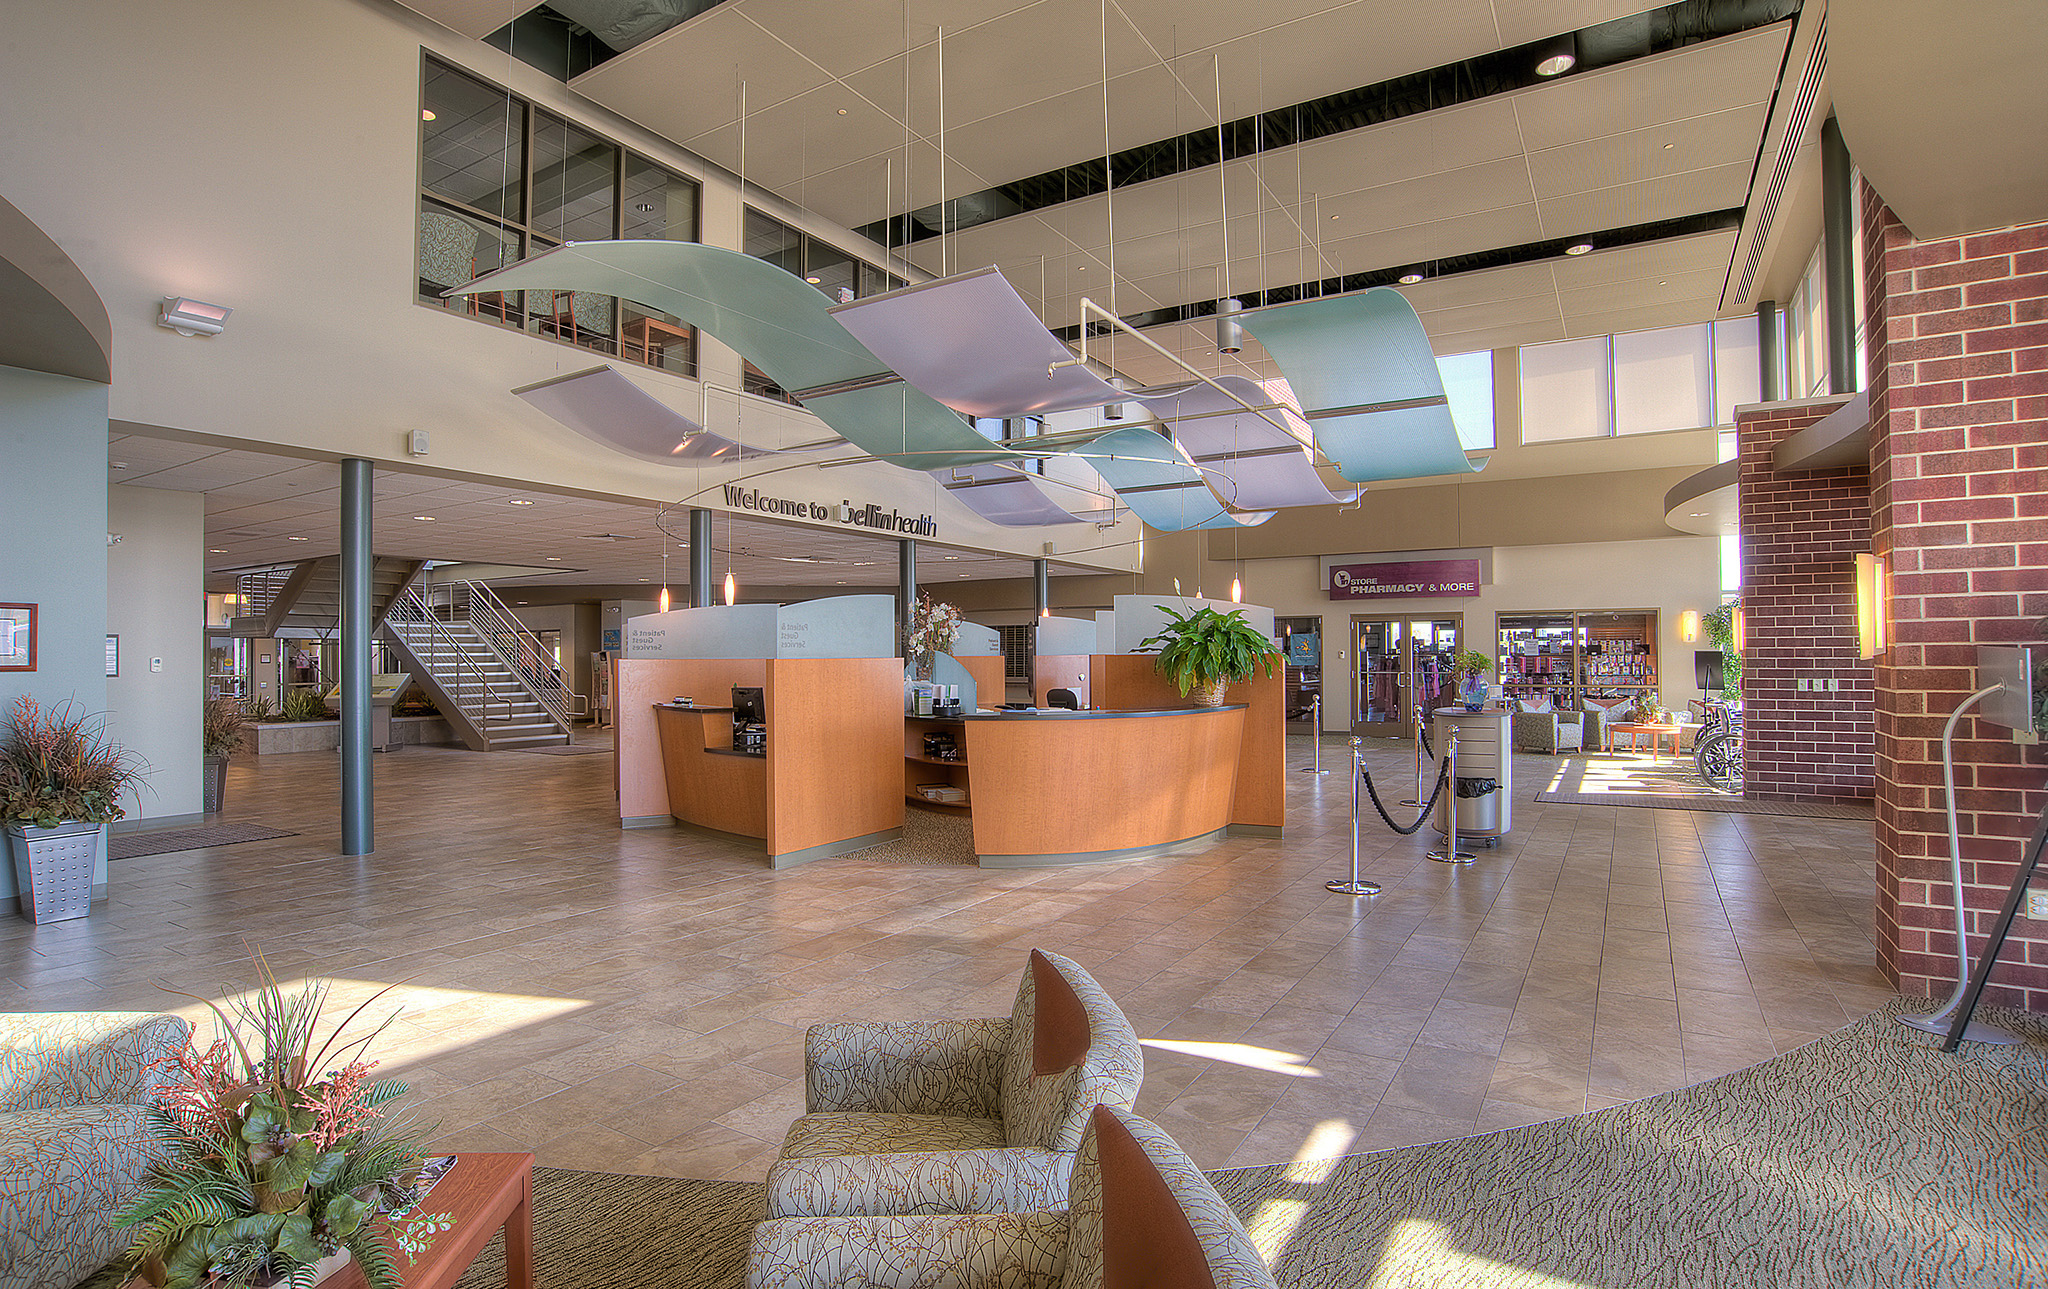 2_Bellevue-Family-Medical-Center